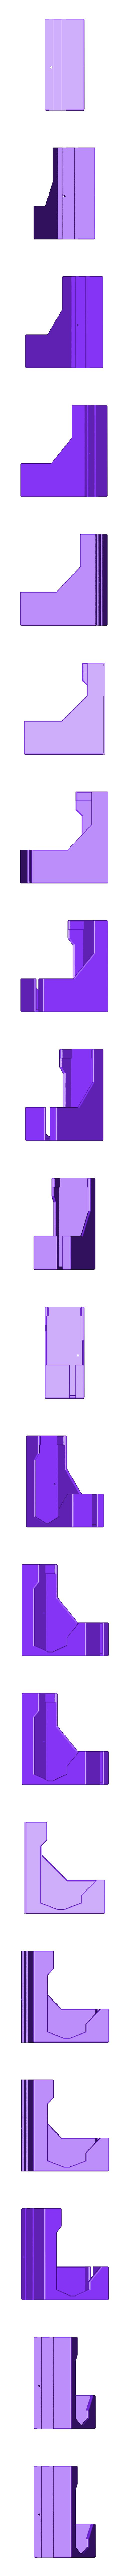 PSU MOUNT SHORT (NO HEX NUT).stl Download free STL file Quick Detachable Ender 3 PSU Power Supply MOUNT • 3D printer object, nrnathan